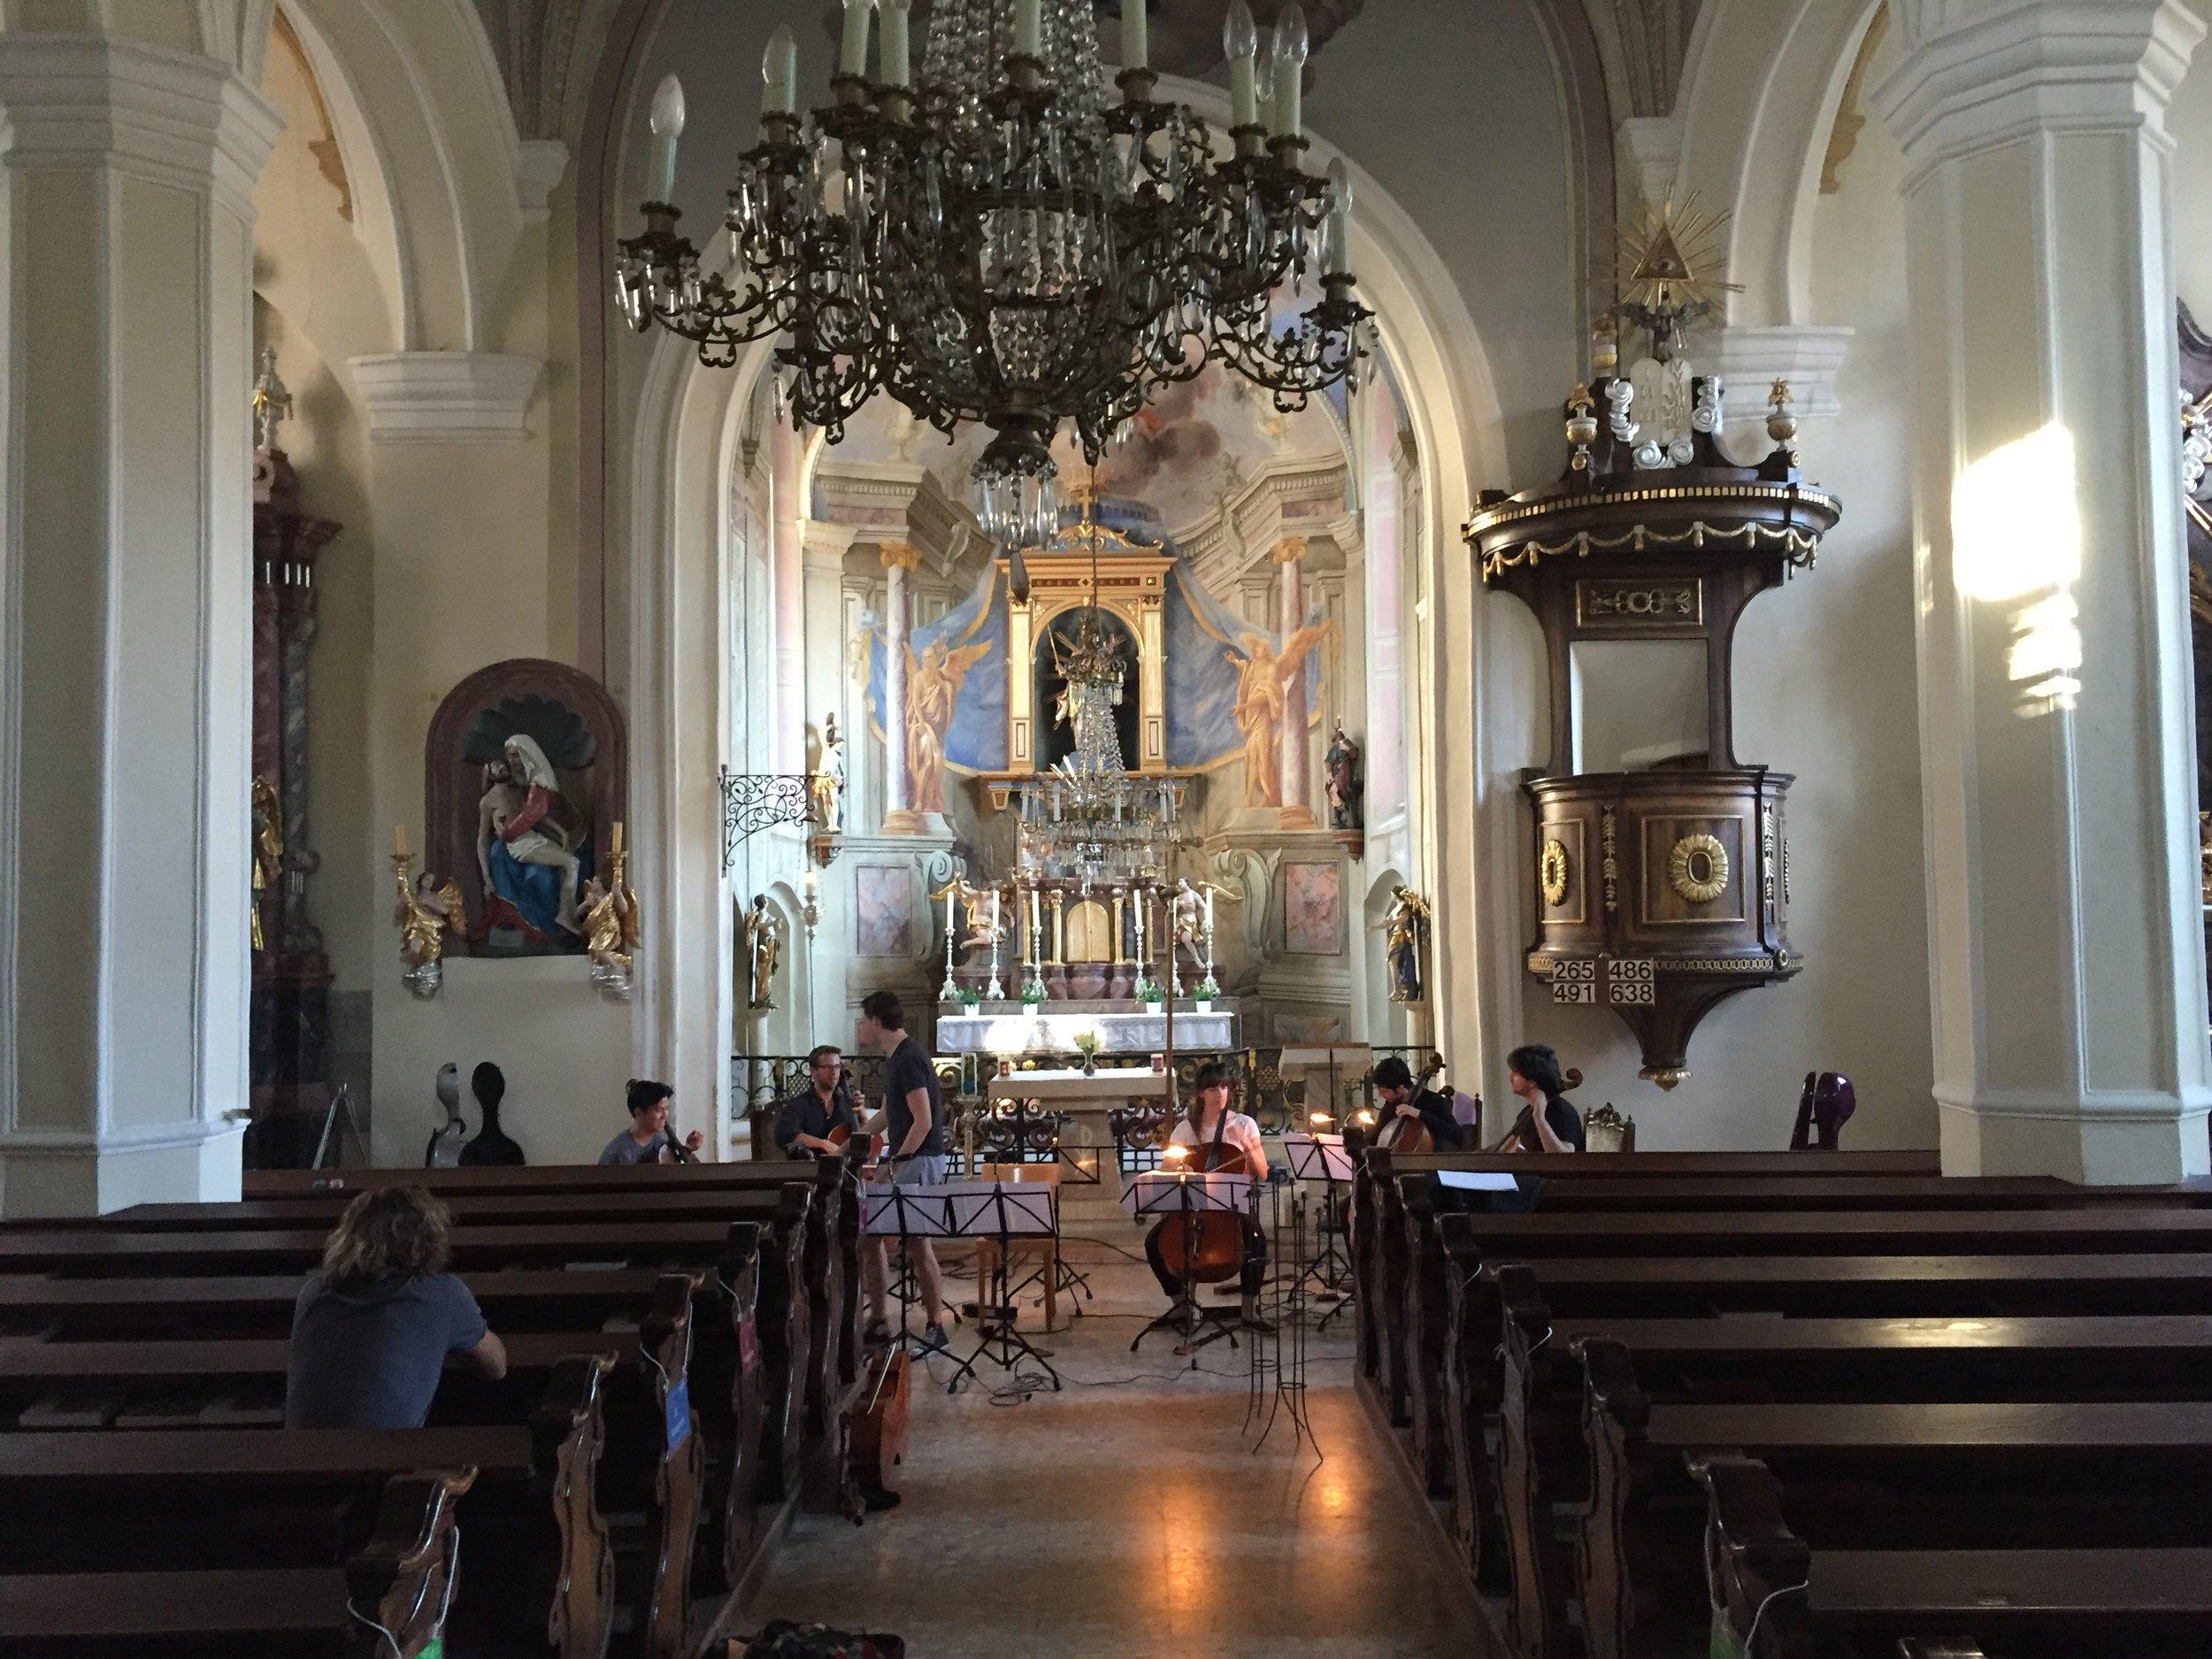 Cello Octett in a church in Steyermark